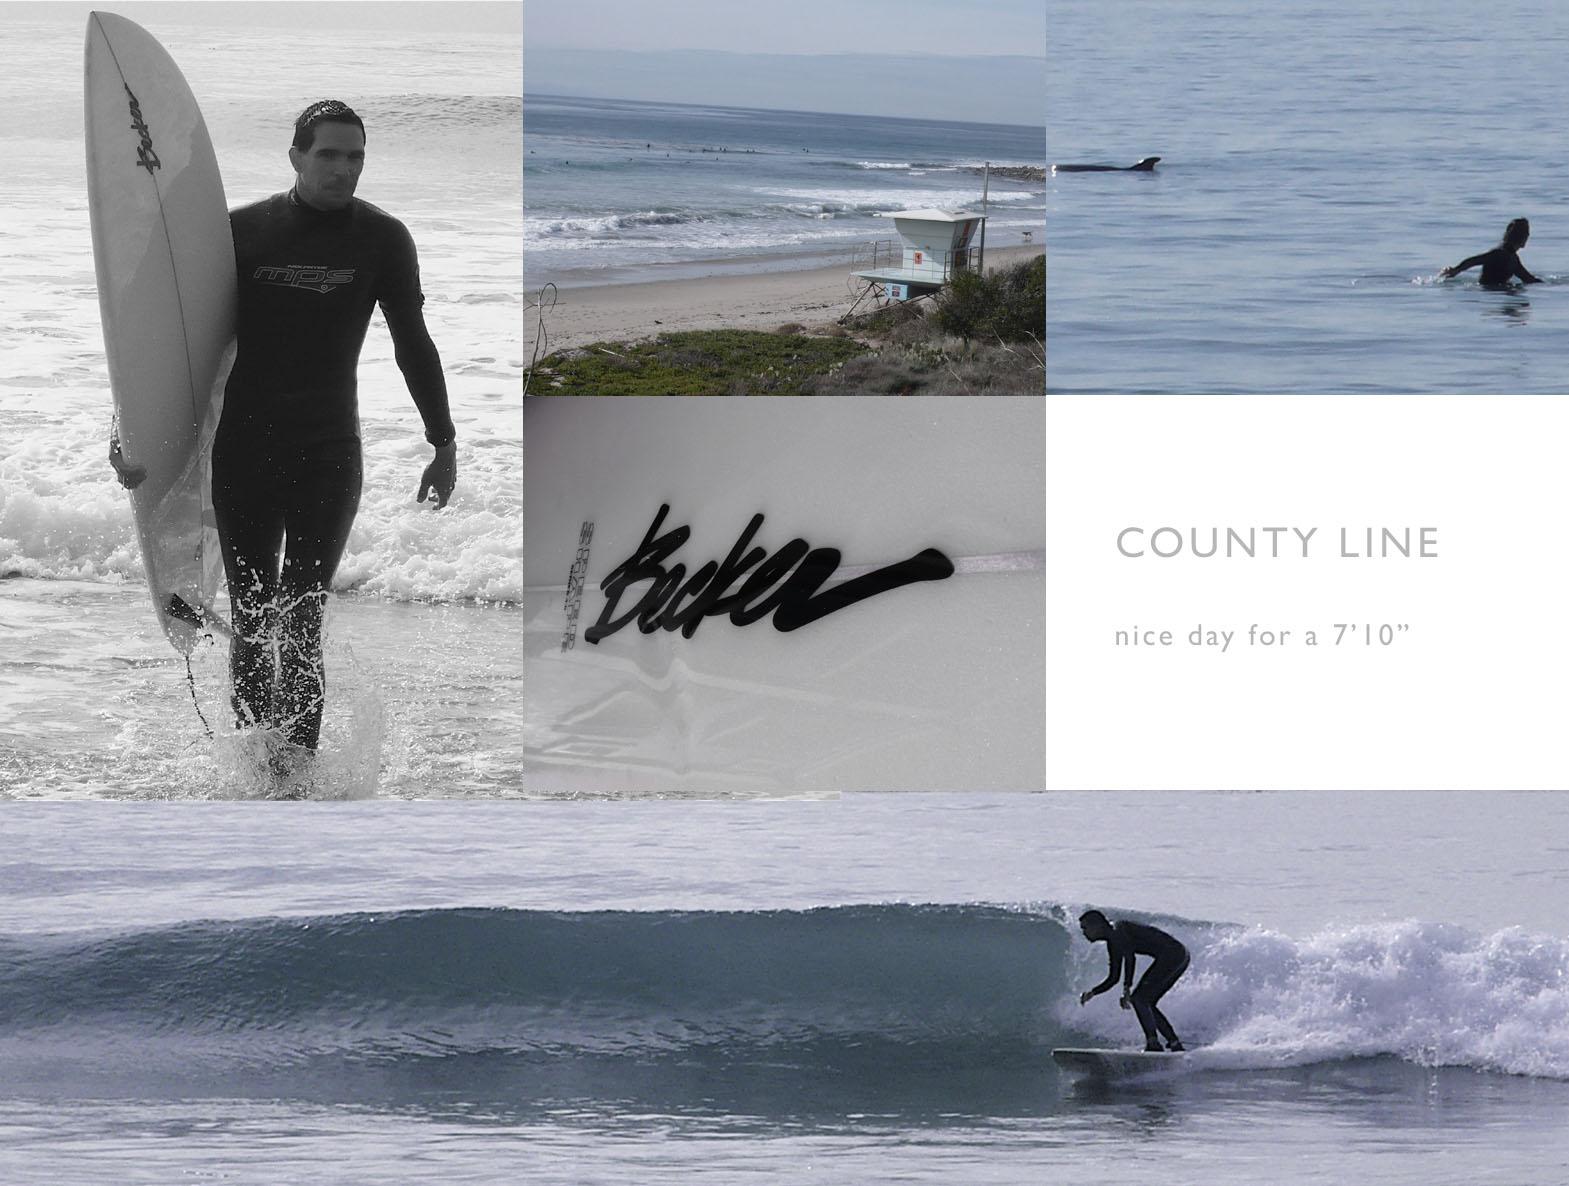 countyline